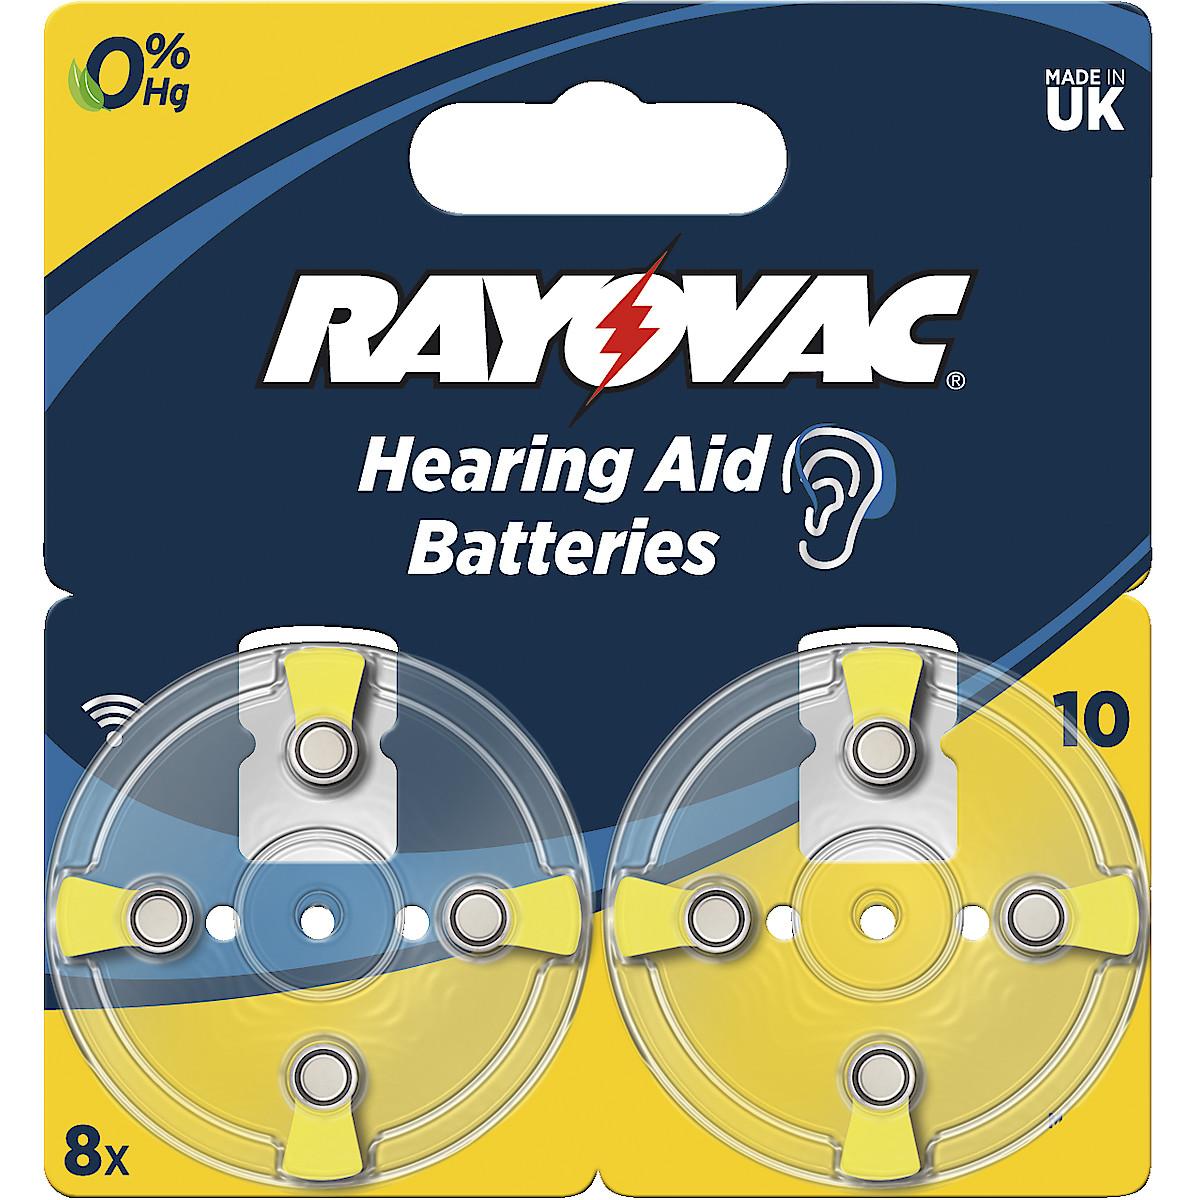 Rayovac 10 høreapparatbatteri